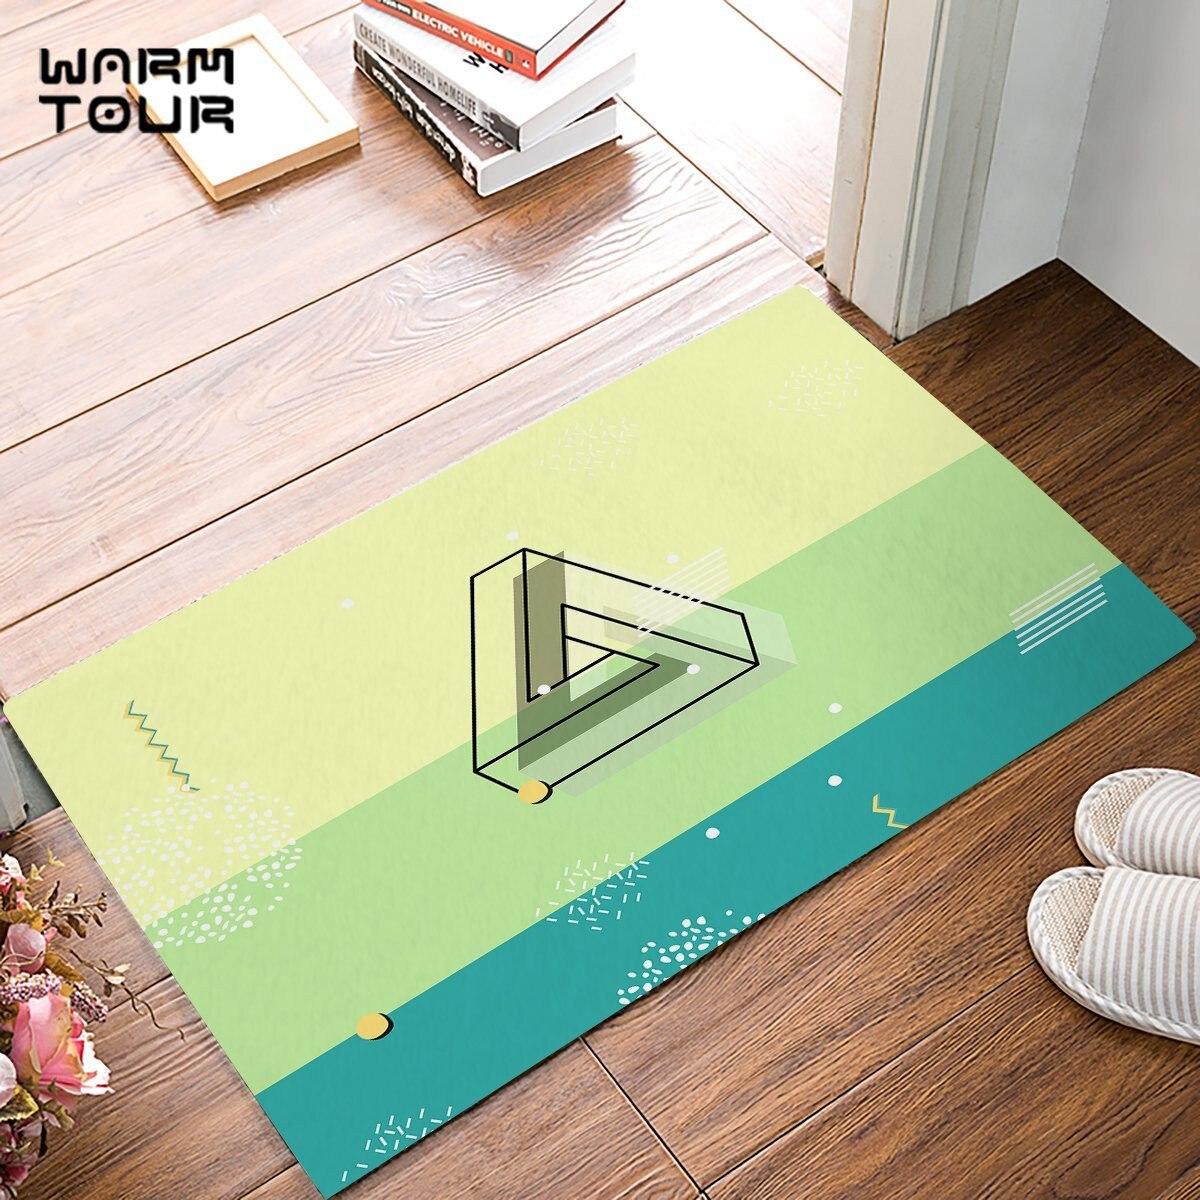 39 X 20 Kitchen Rugs Colorful Stripe Rainbow Design Non-Slip Soft Kitchen Mats Bath Rug Runner Doormats Carpet for Home Decor